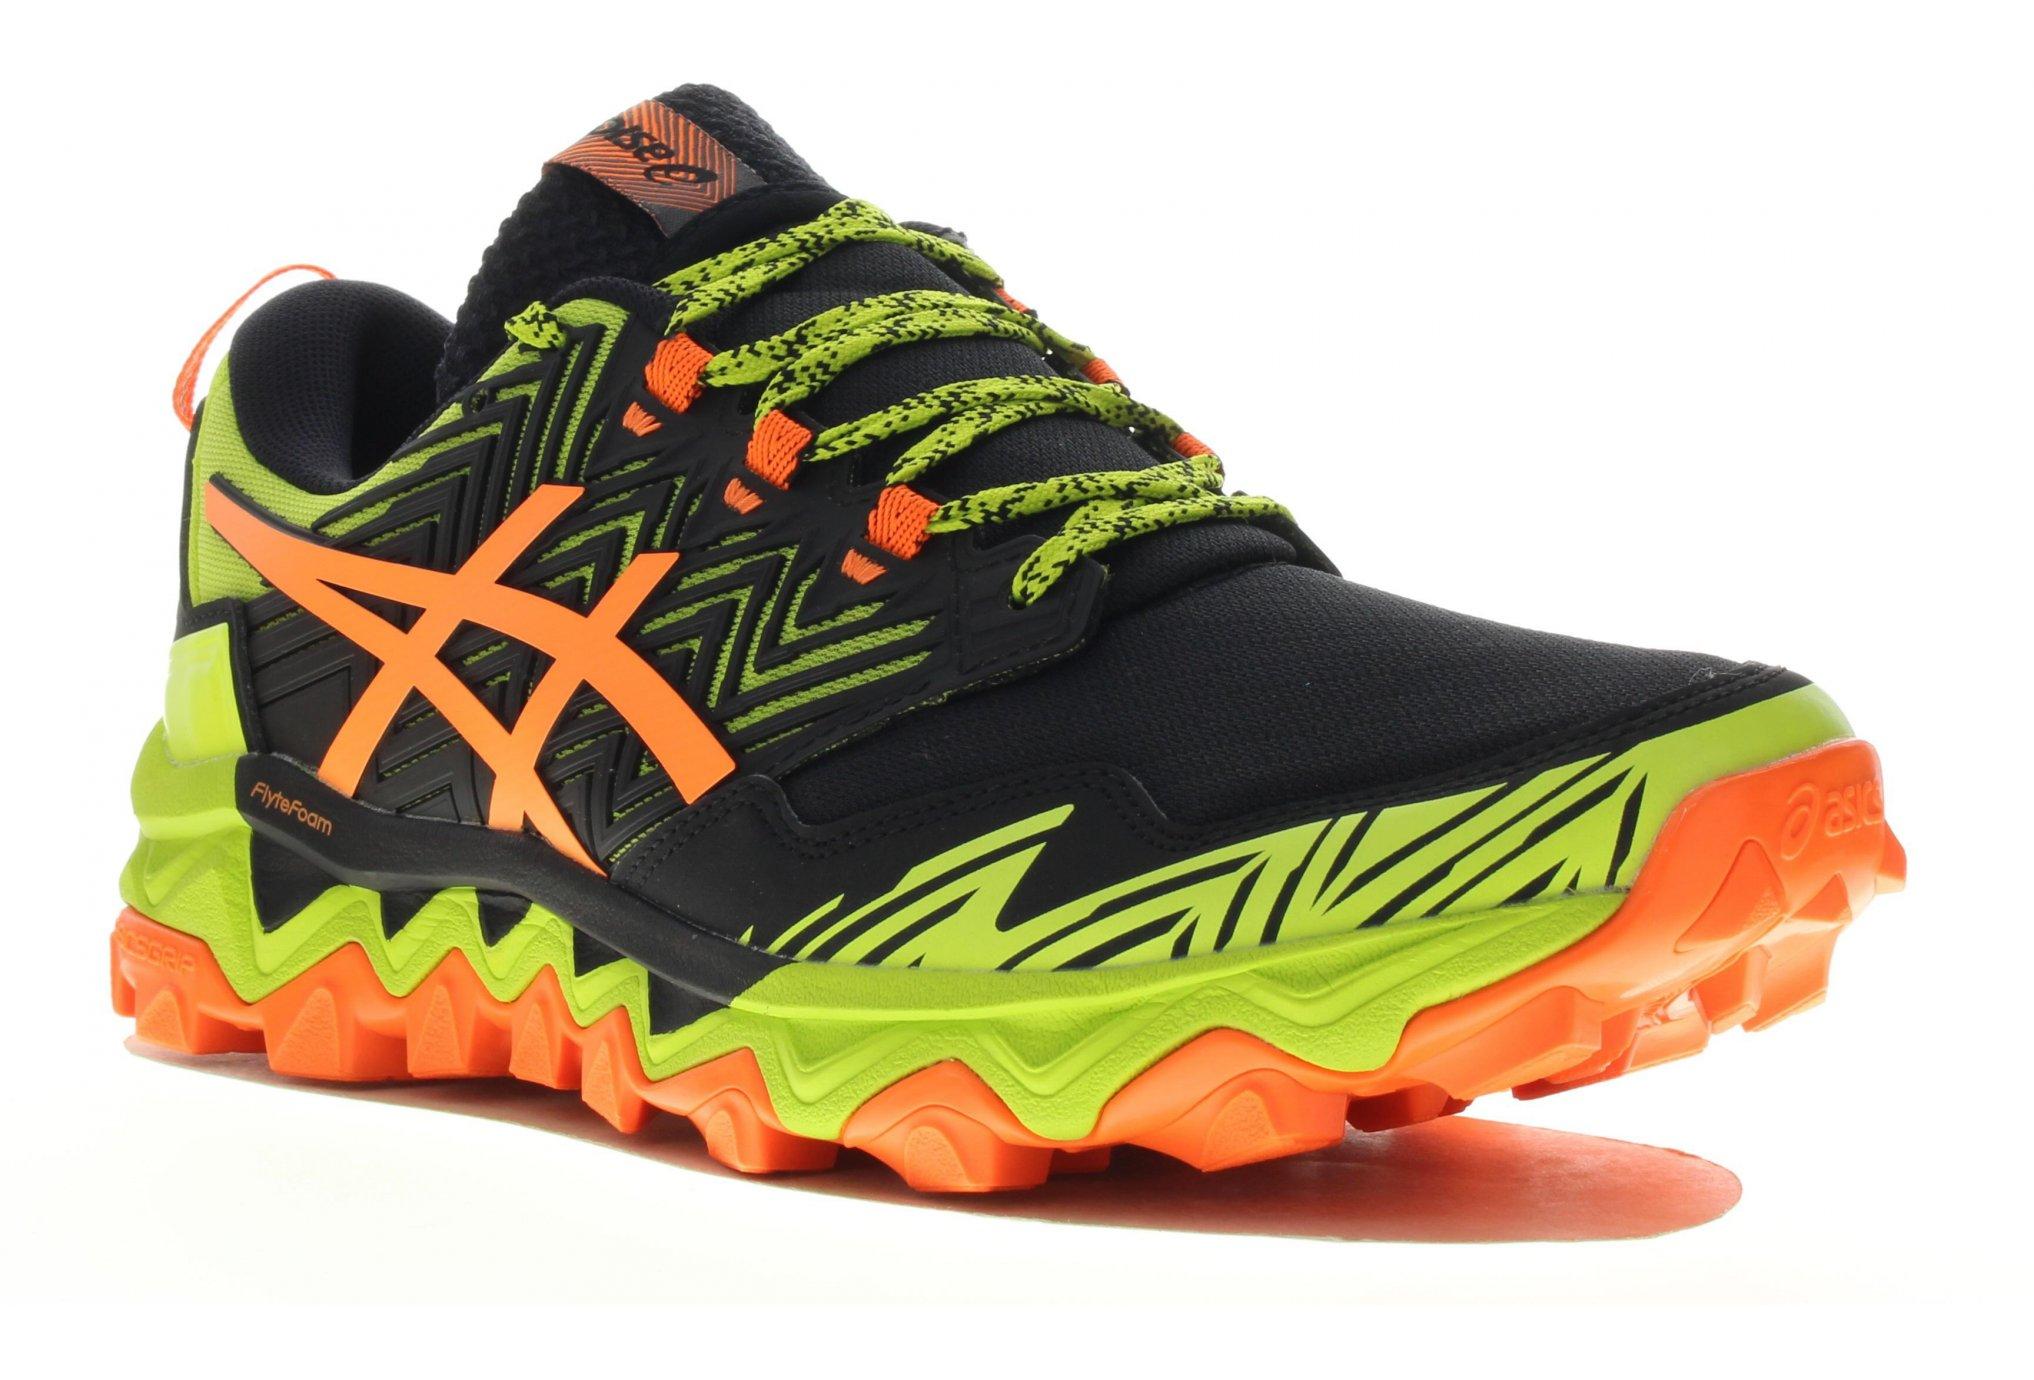 ASICS : la gamme des chaussures de trail - U Run